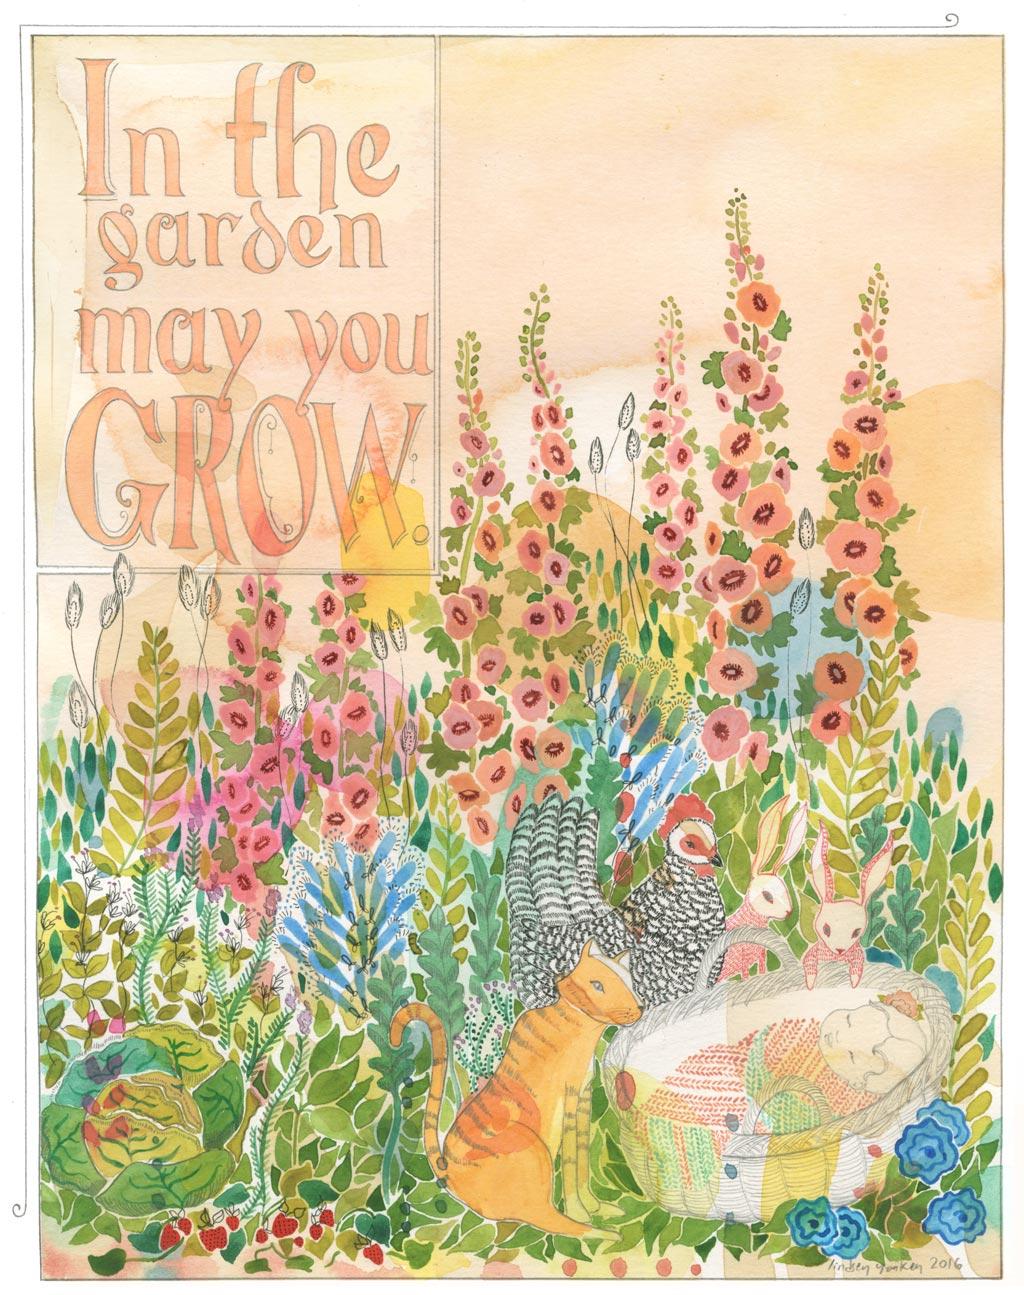 Garden, watercolor, pen, pencil